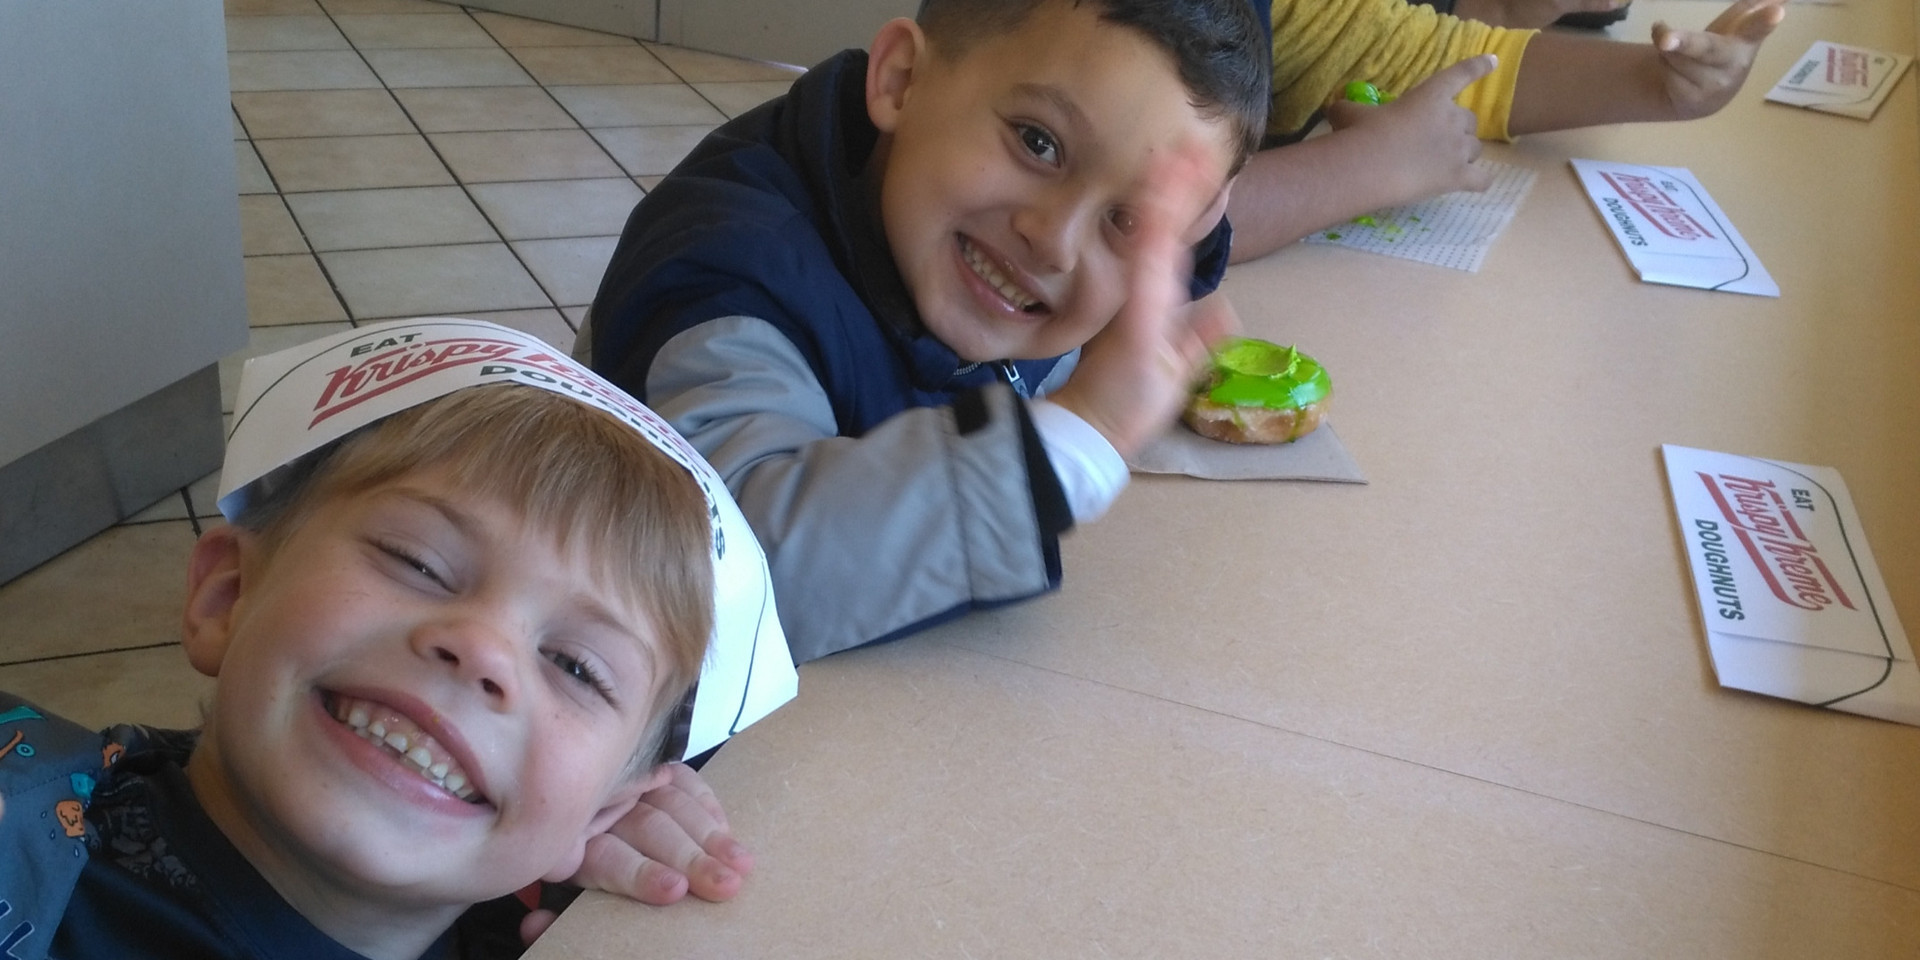 Fun Friday trip to Krispy Kreme